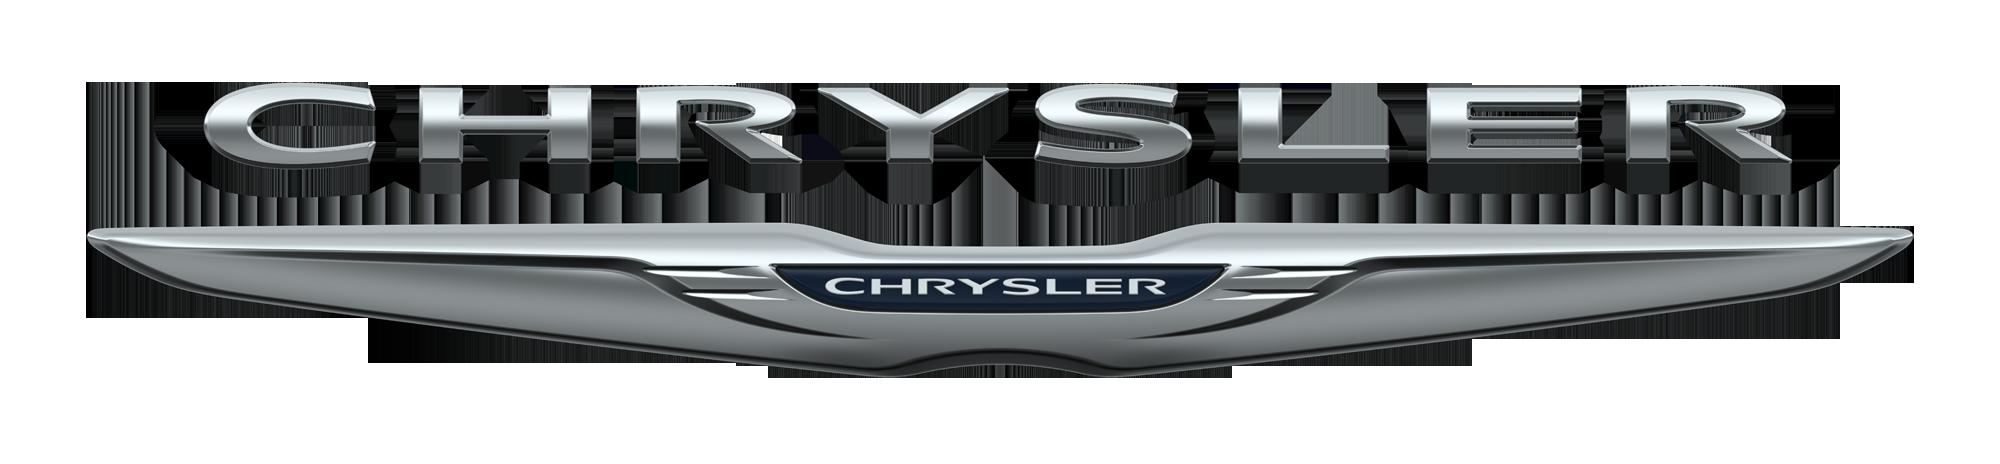 chrysler-png-chrysler-2000.png